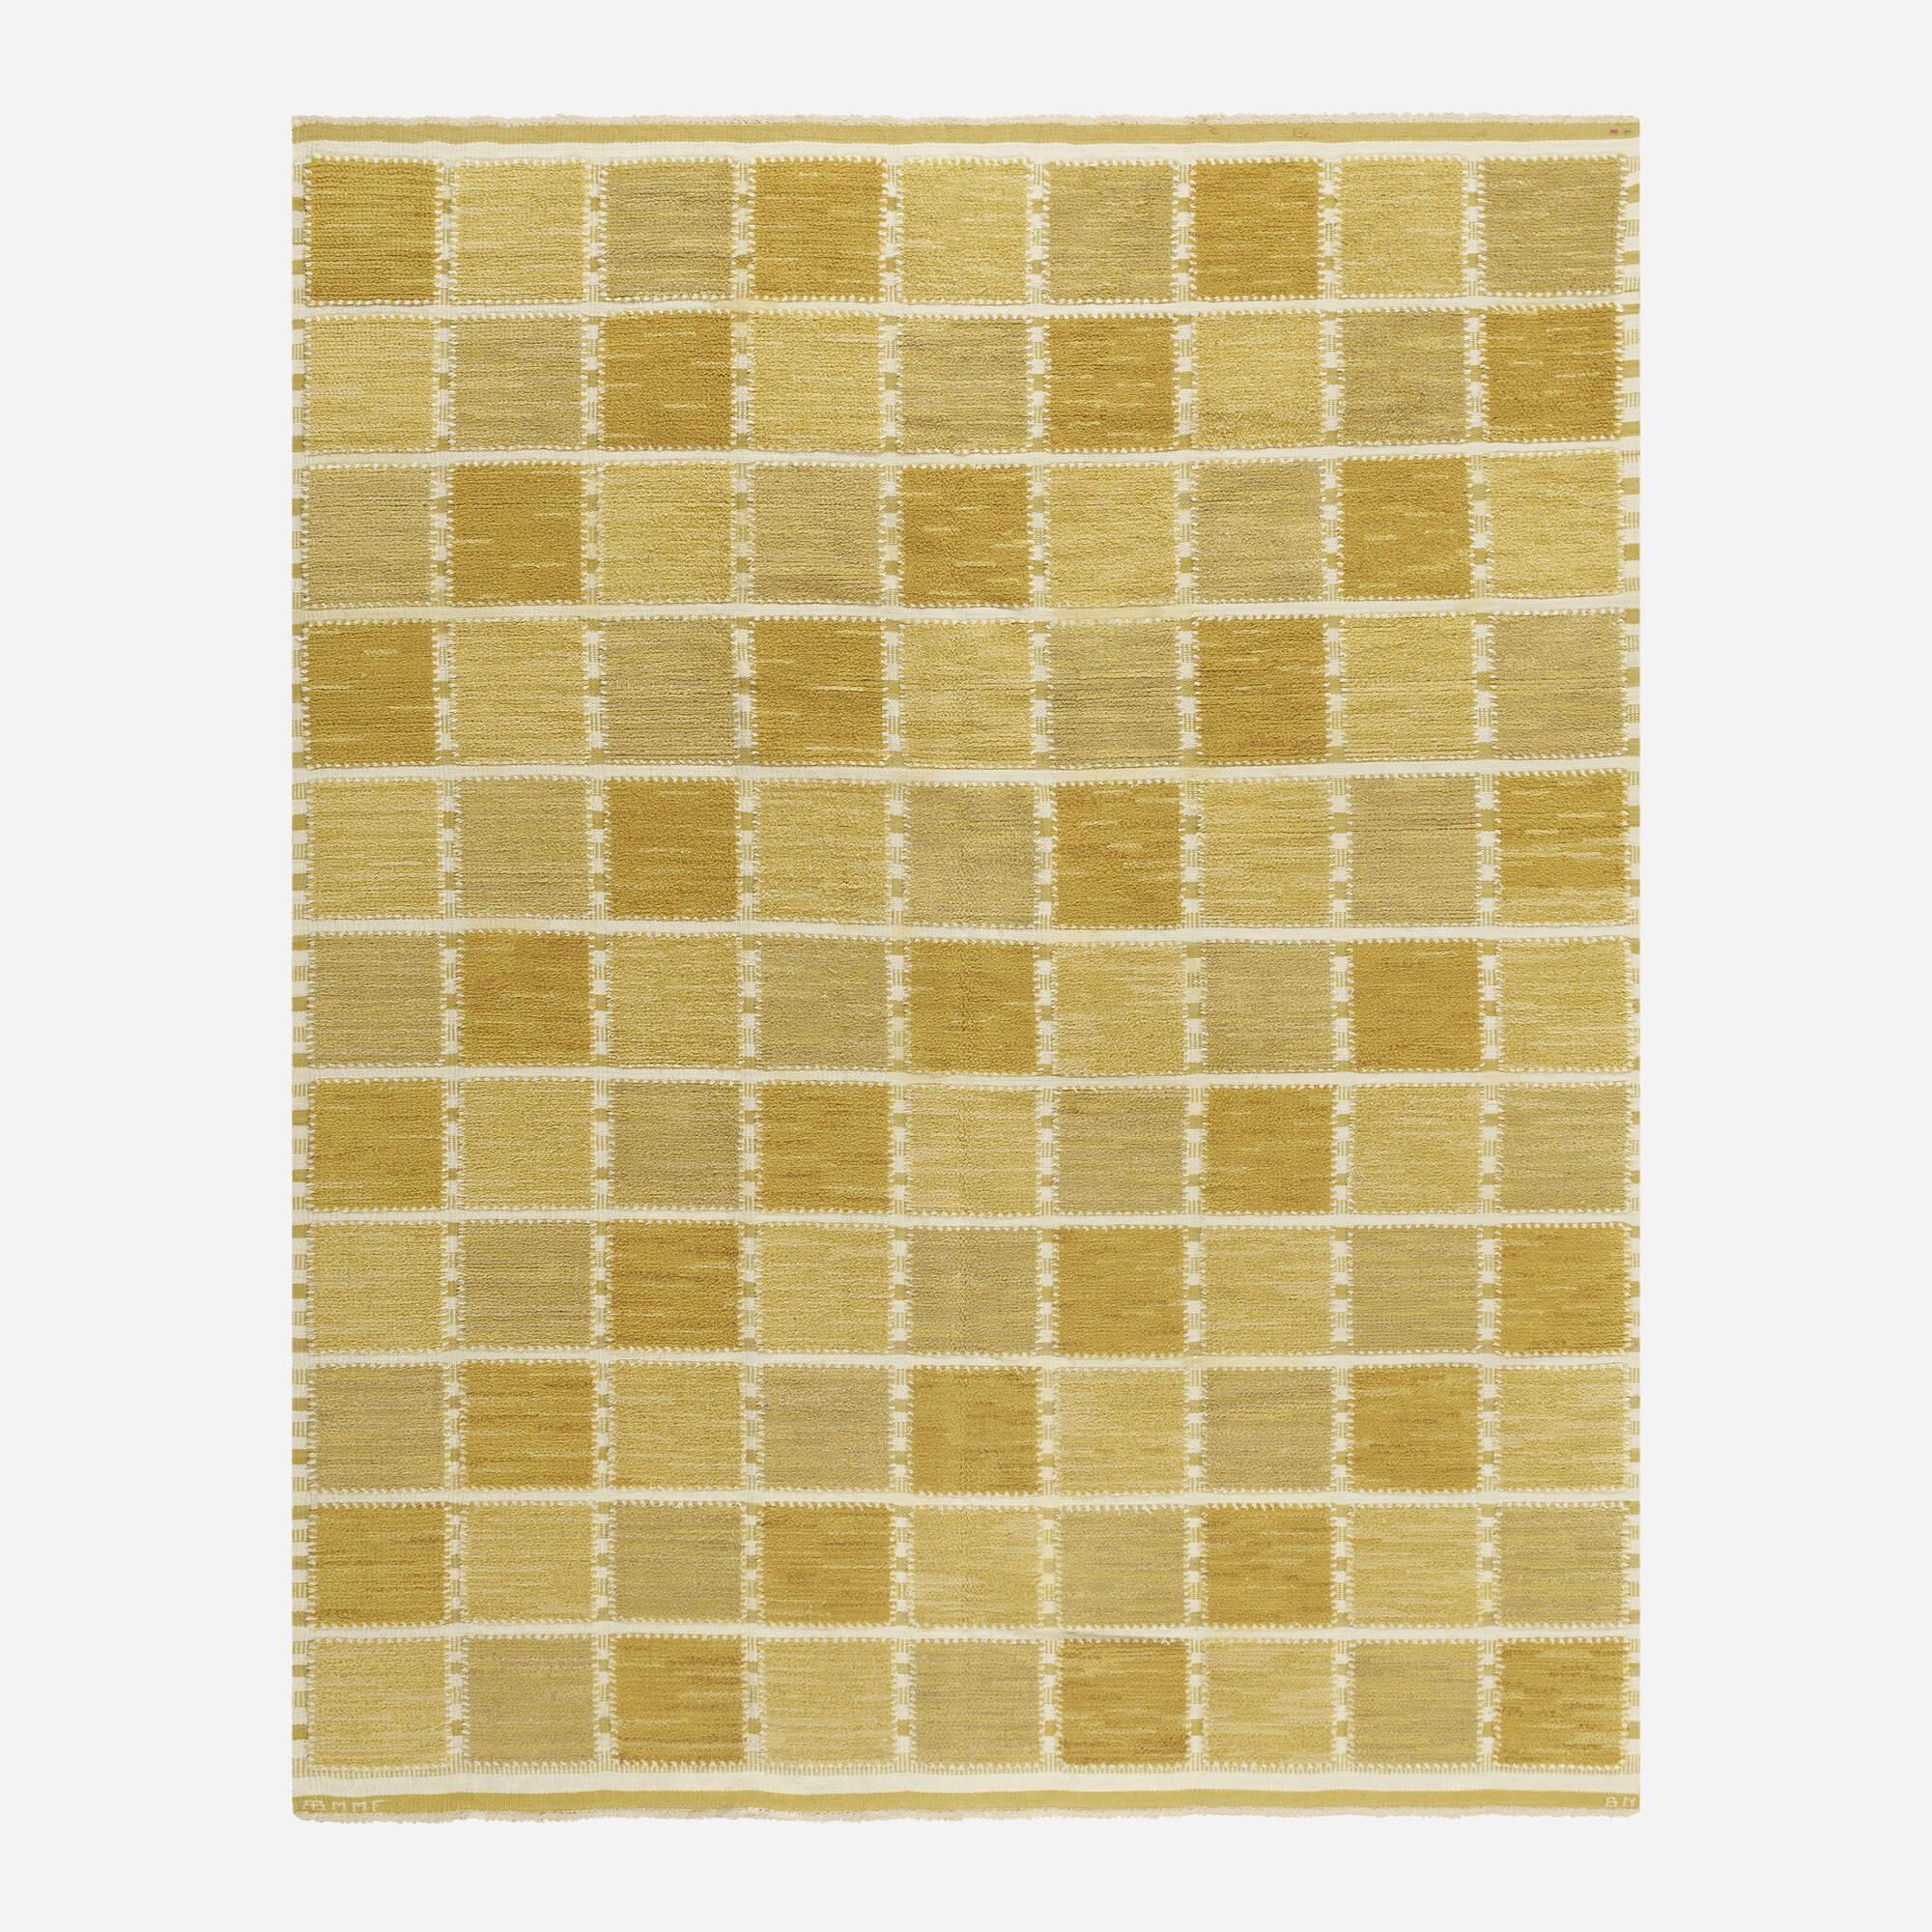 121: Barbro Nilsson / Gyllenrutan half-pile carpet (1 of 3)